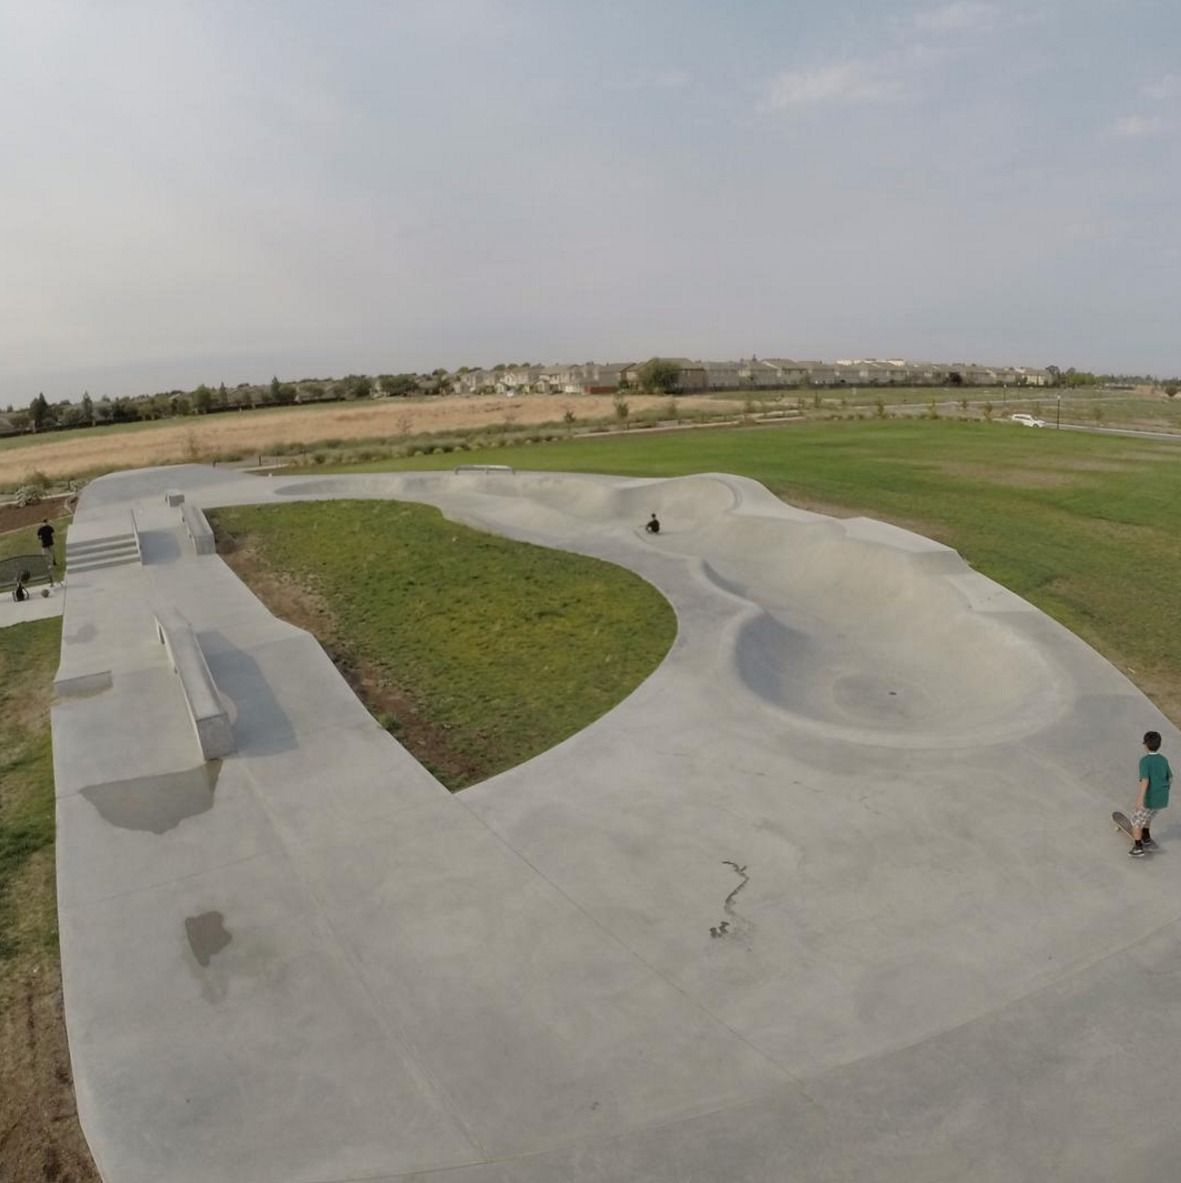 wild rose skatepark, sacramento, california